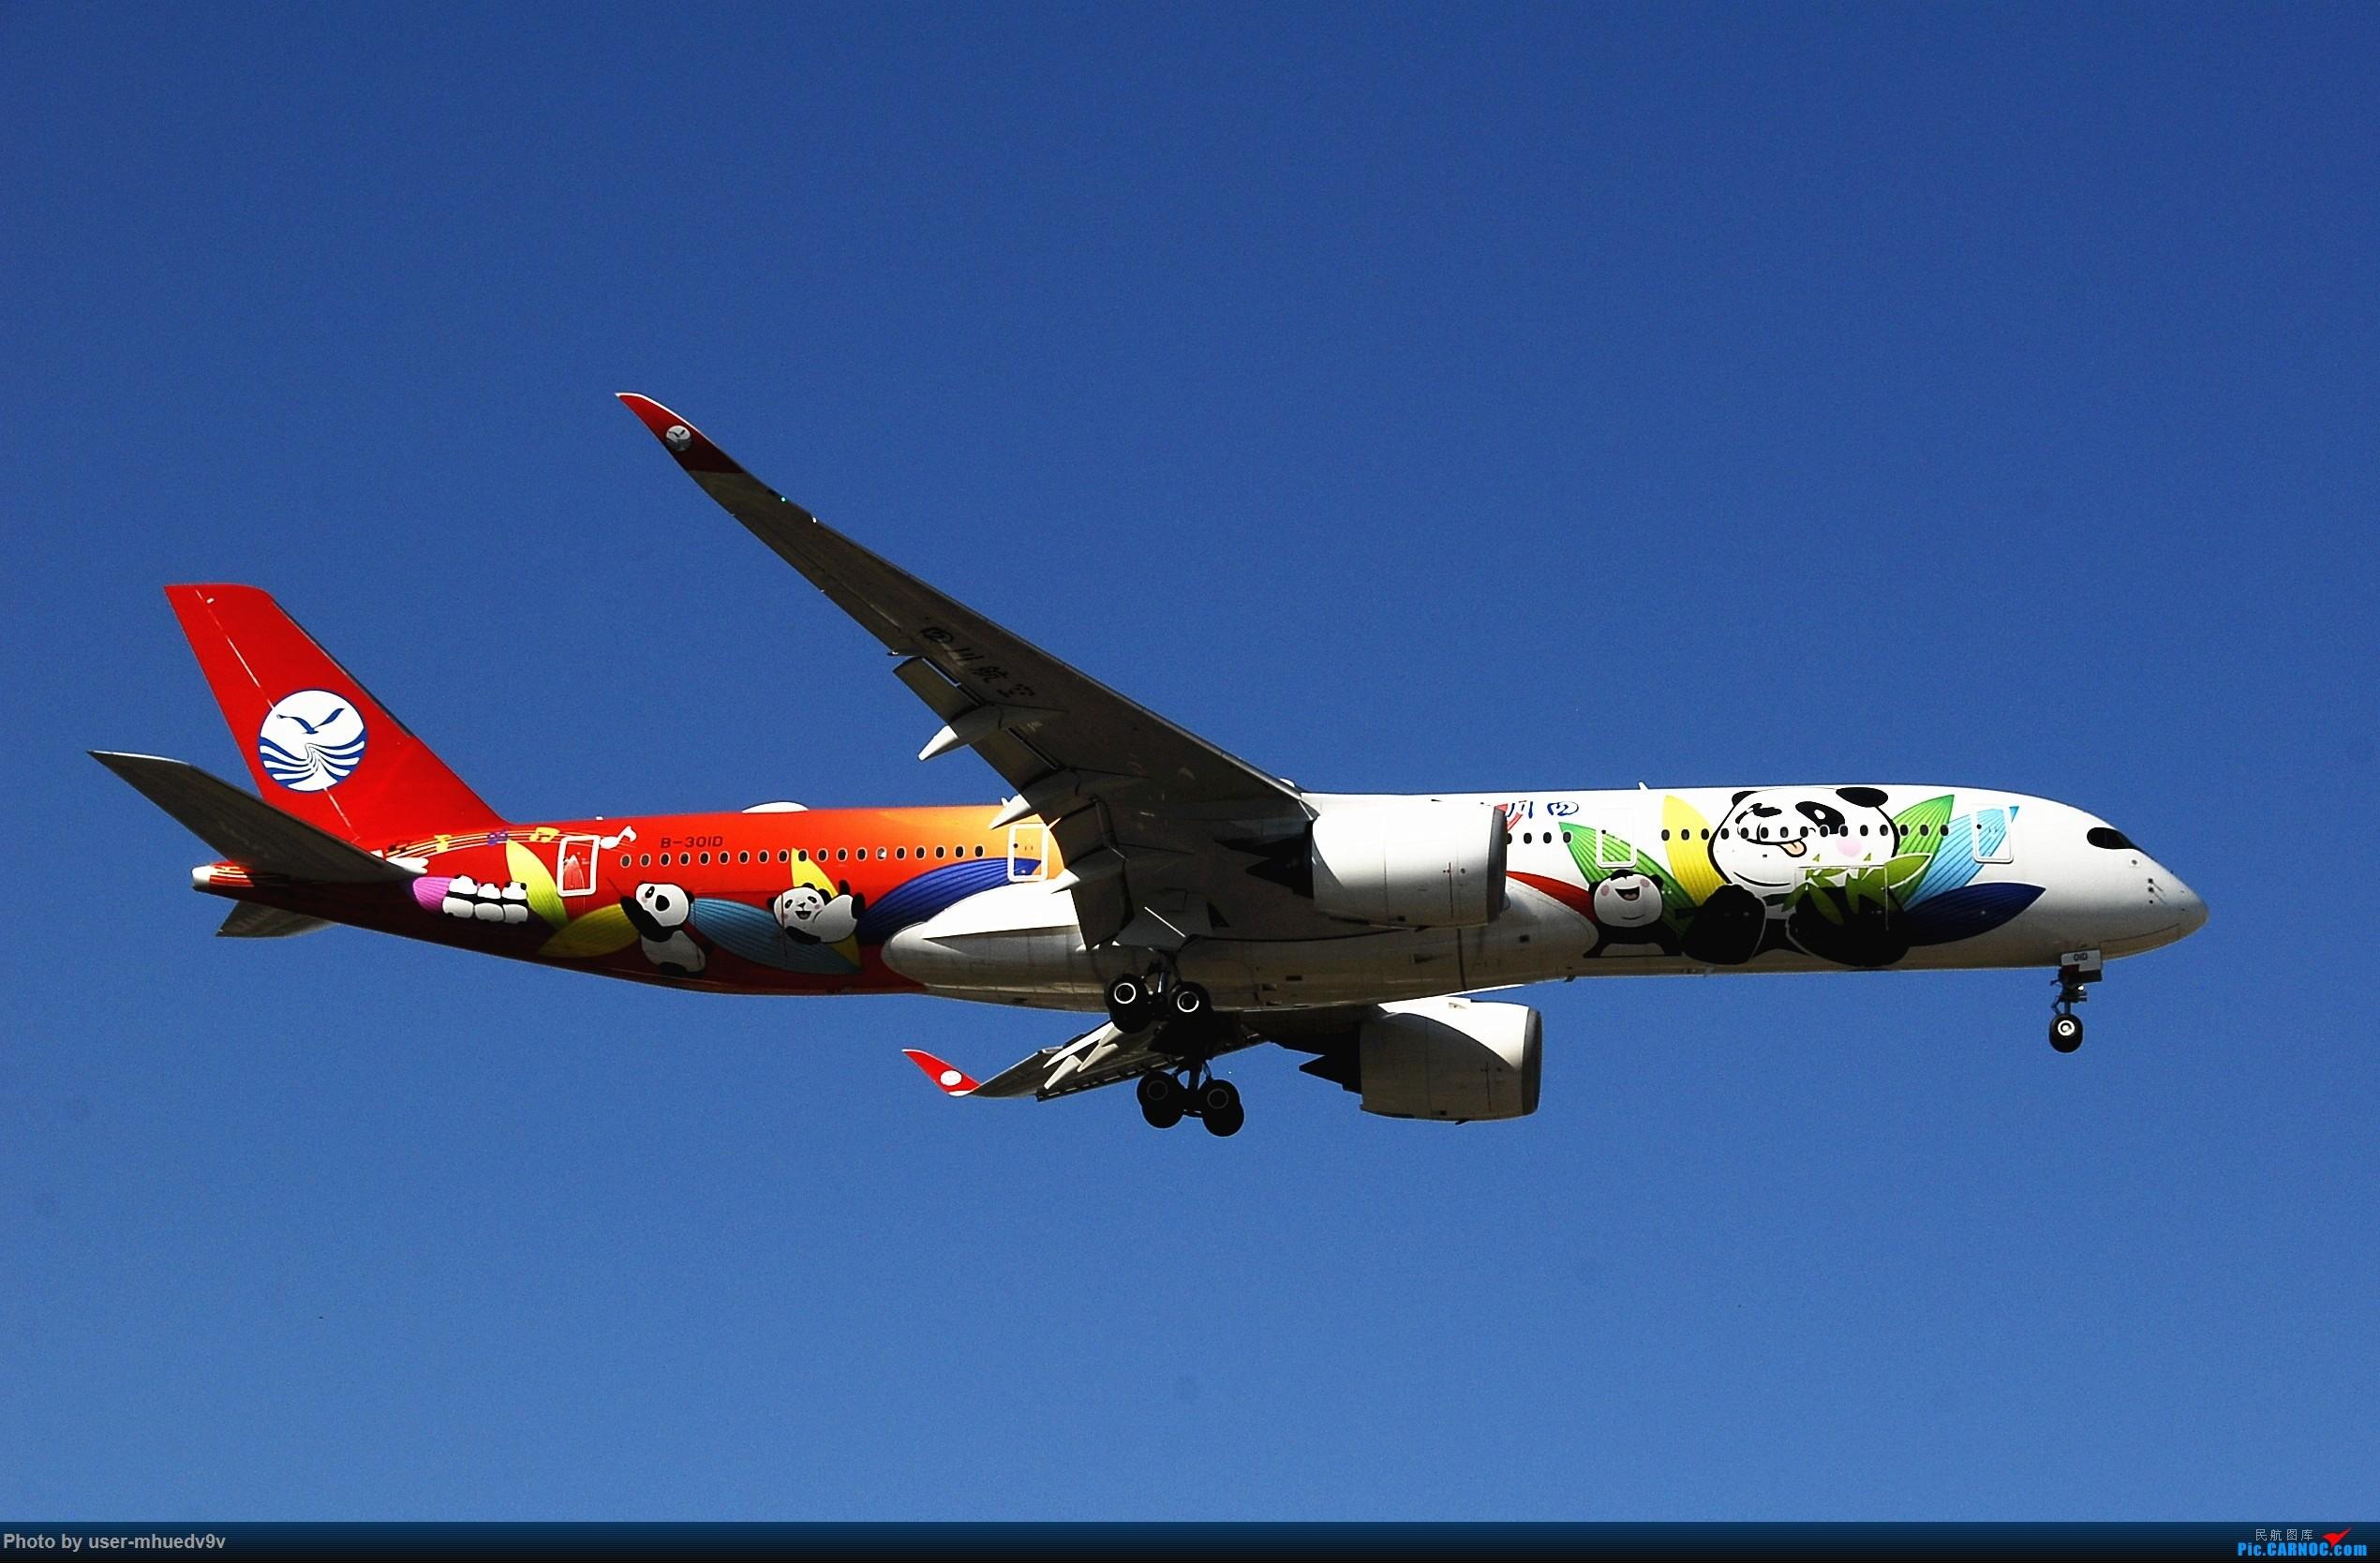 Re:[原创]十一难得北京妖天,萌新ZBAA拍机一组干货,大佬勿喷,马上月考更要放飞自我。。。 AIRBUS A350-900 B-301D 中国北京首都国际机场